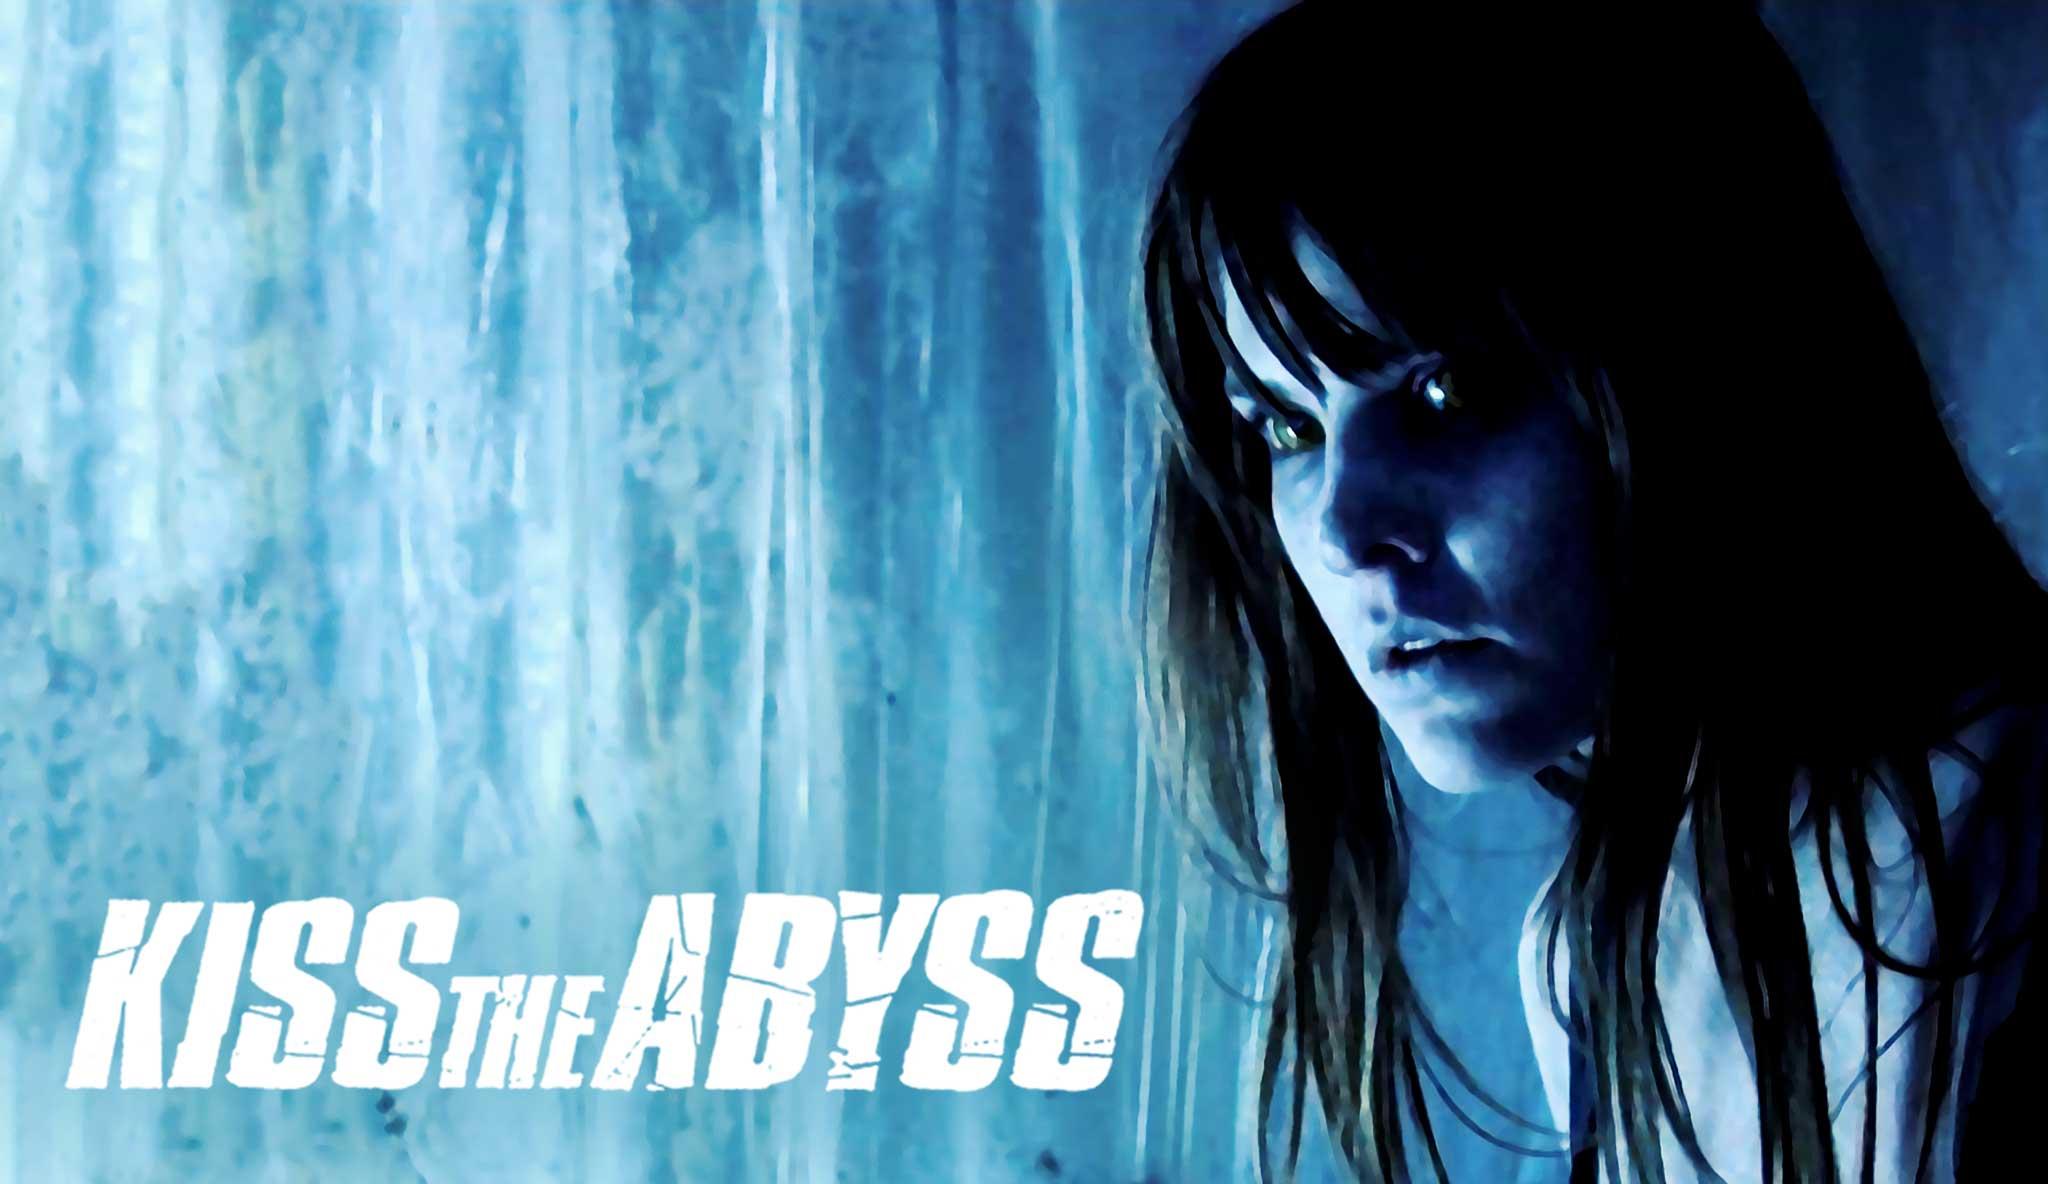 kiss-the-abyss\header.jpg